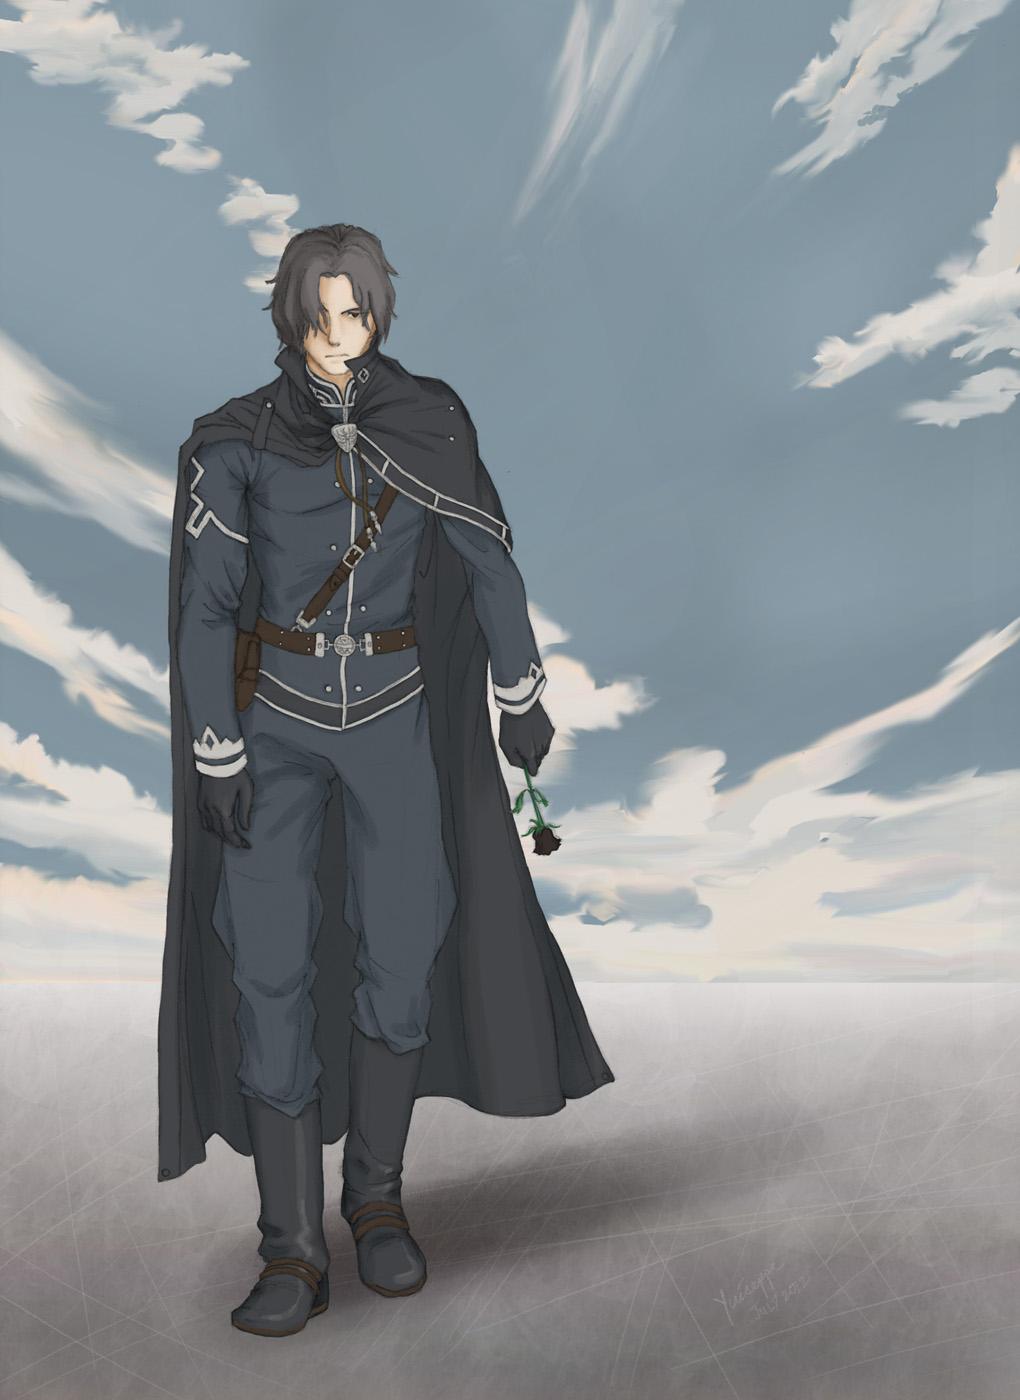 Image Result For Anime Wallpaper Reda